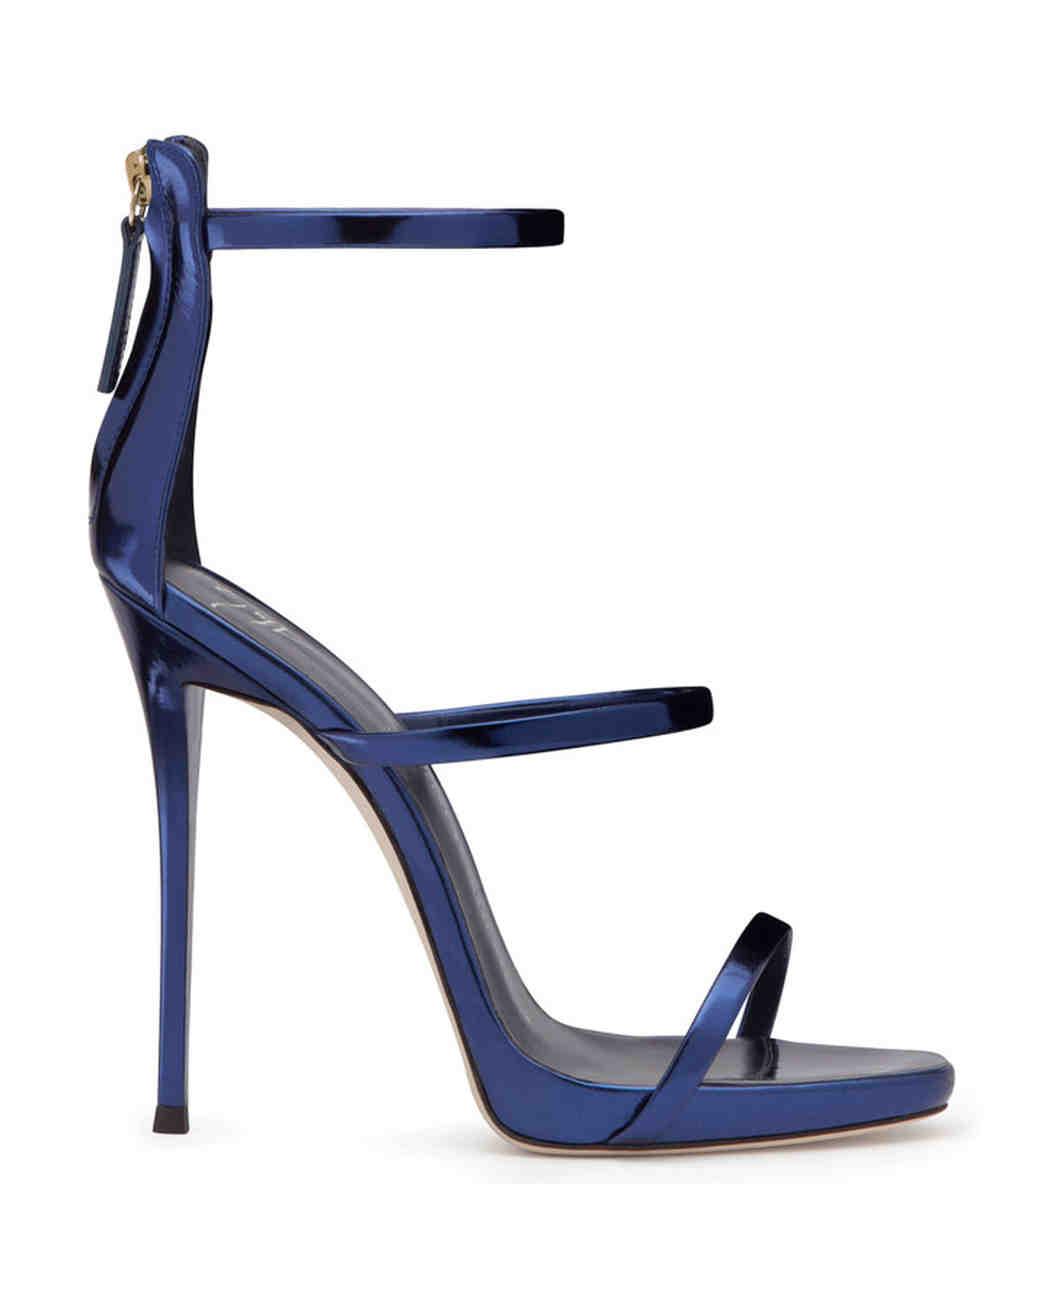 Giuseppi Zanotti Blue Patent Leather Sandals